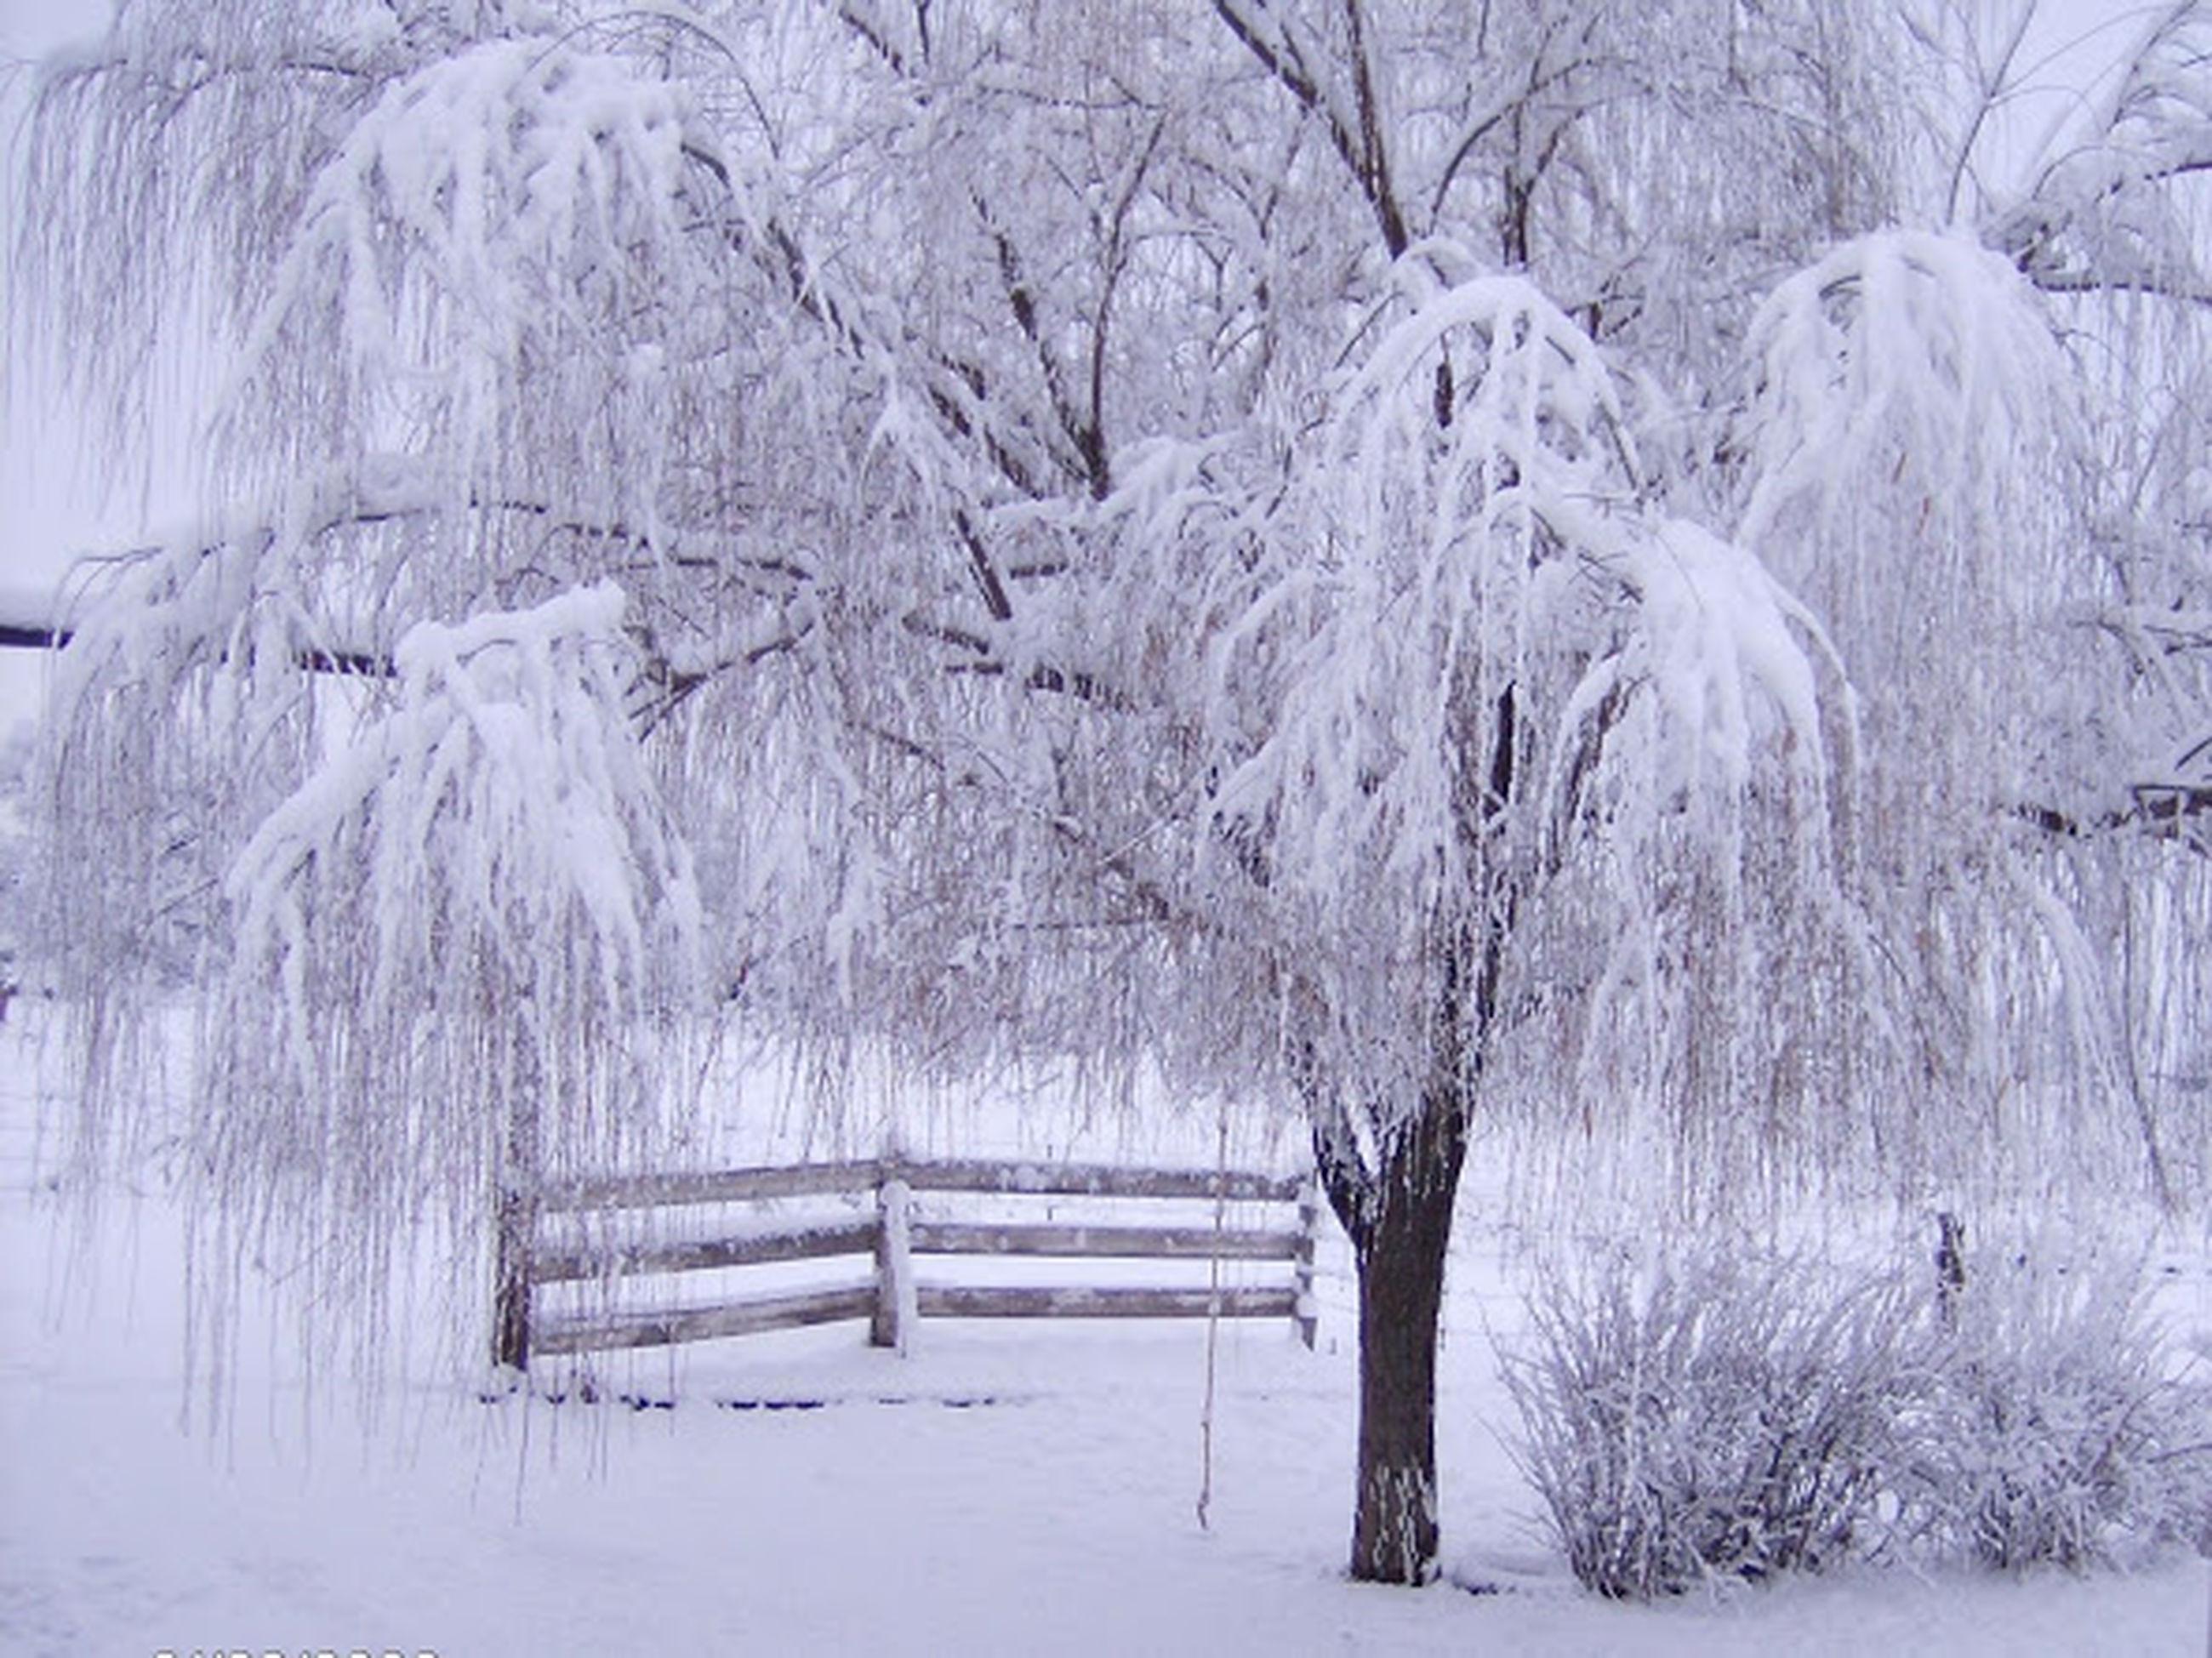 snow, winter, cold temperature, season, weather, covering, tranquil scene, tranquility, tree, landscape, nature, beauty in nature, frozen, scenics, field, bare tree, covered, white color, non-urban scene, bench